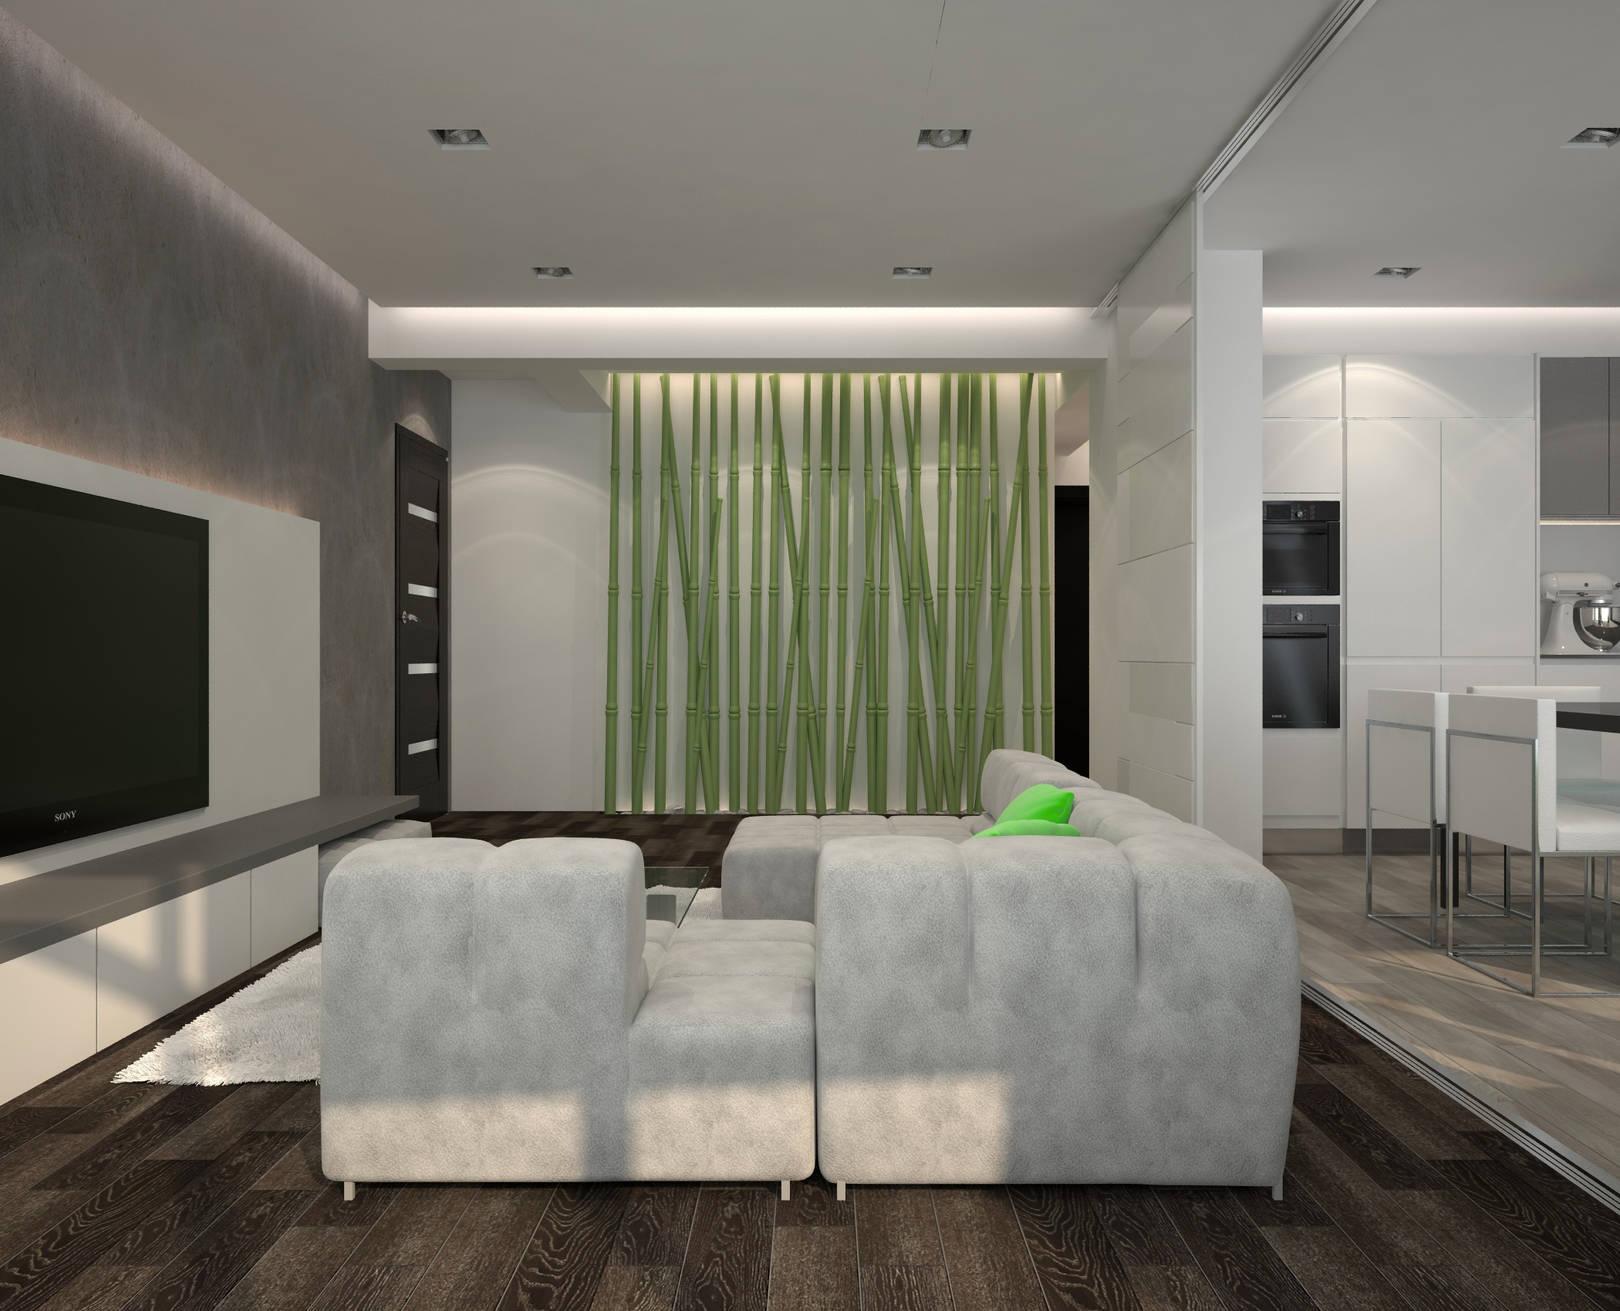 The minimal flat